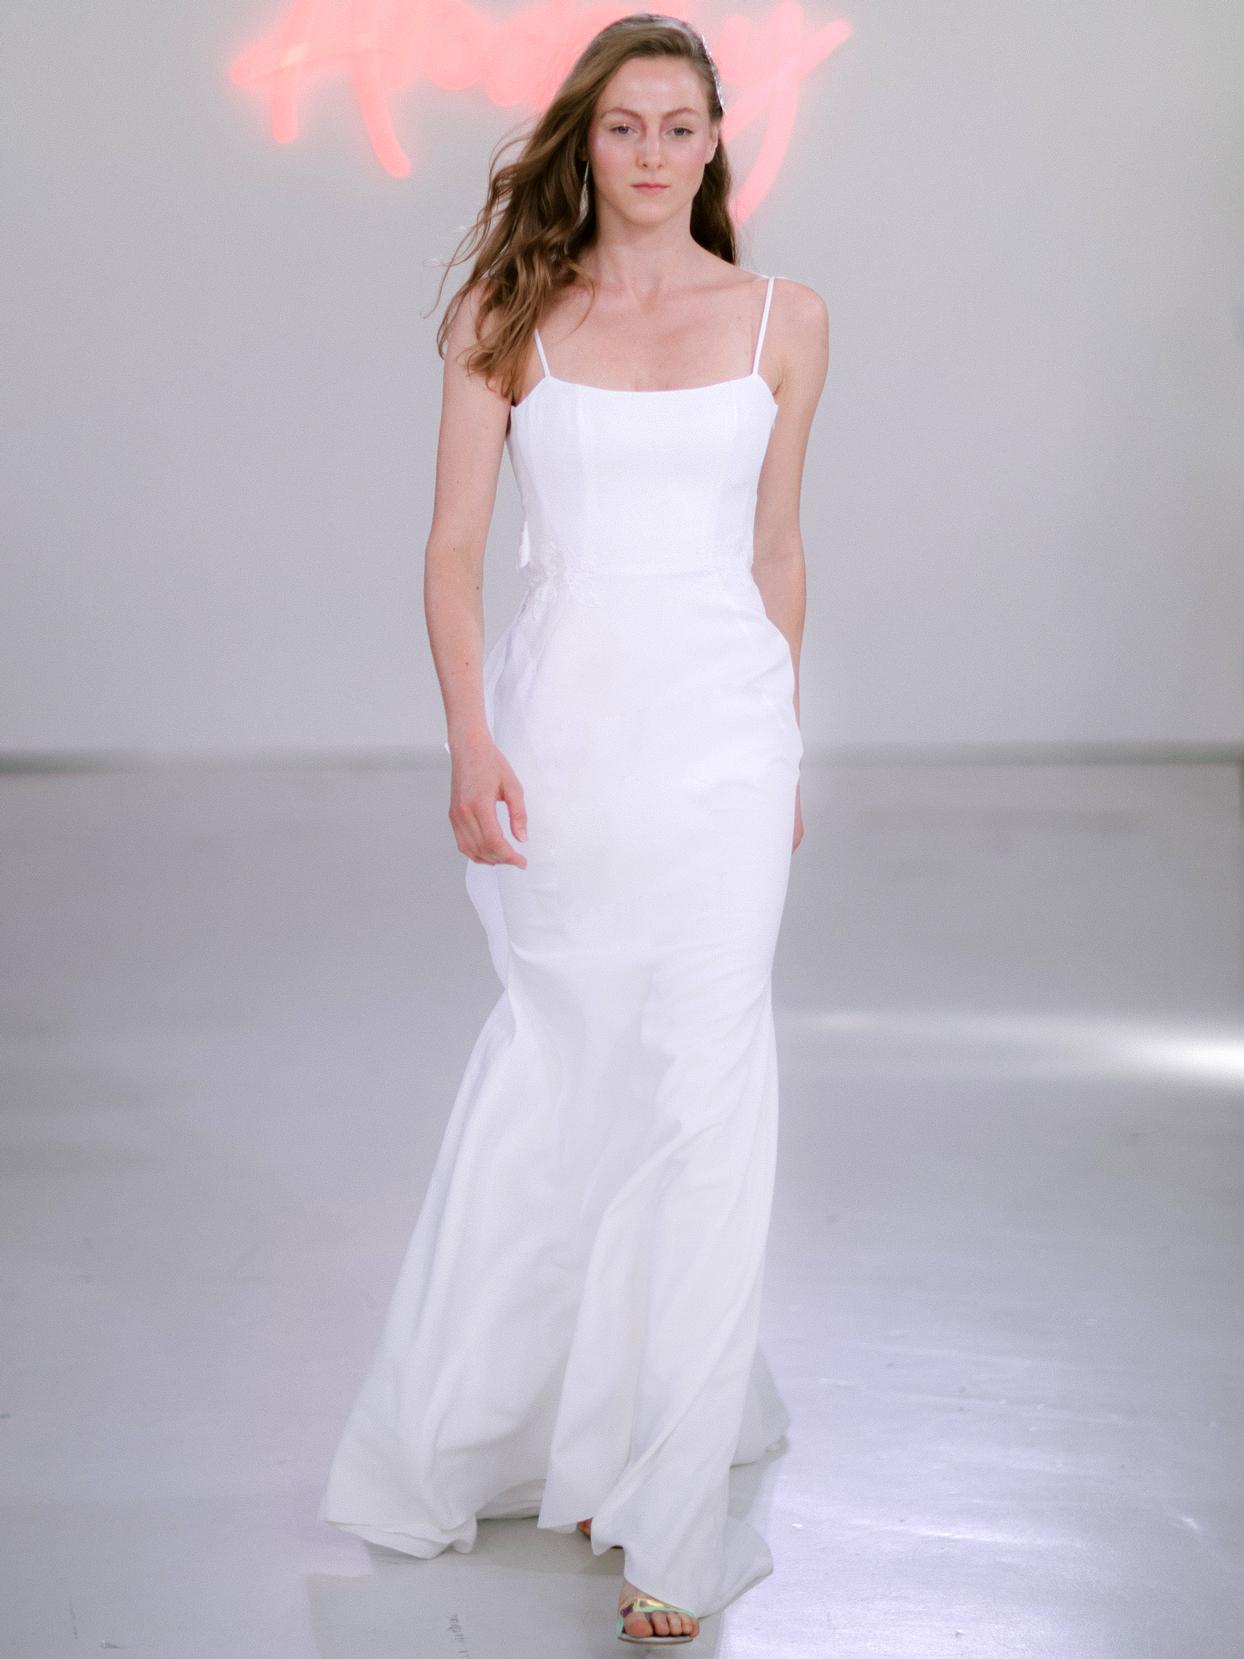 Rime Arodaky X The Mews Bridal spaghetti strap square neckline wedding dress fall 2020